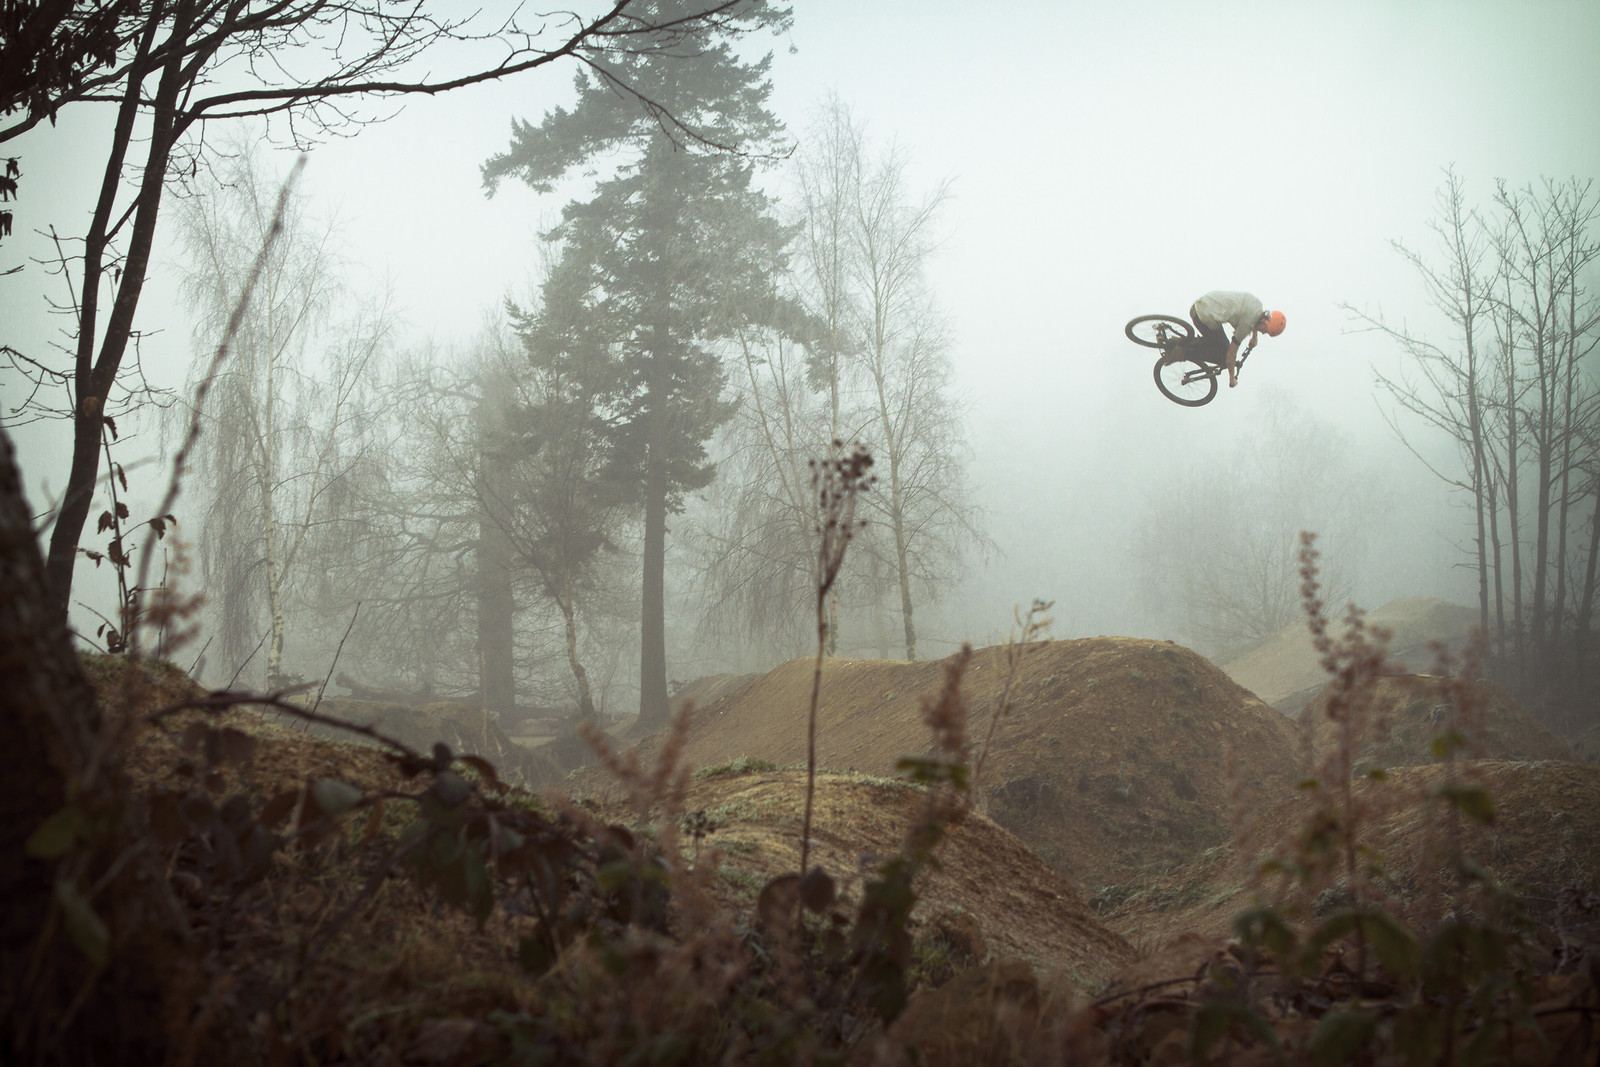 Matt Jones twists through the fog - jamieledson - Mountain Biking Pictures - Vital MTB